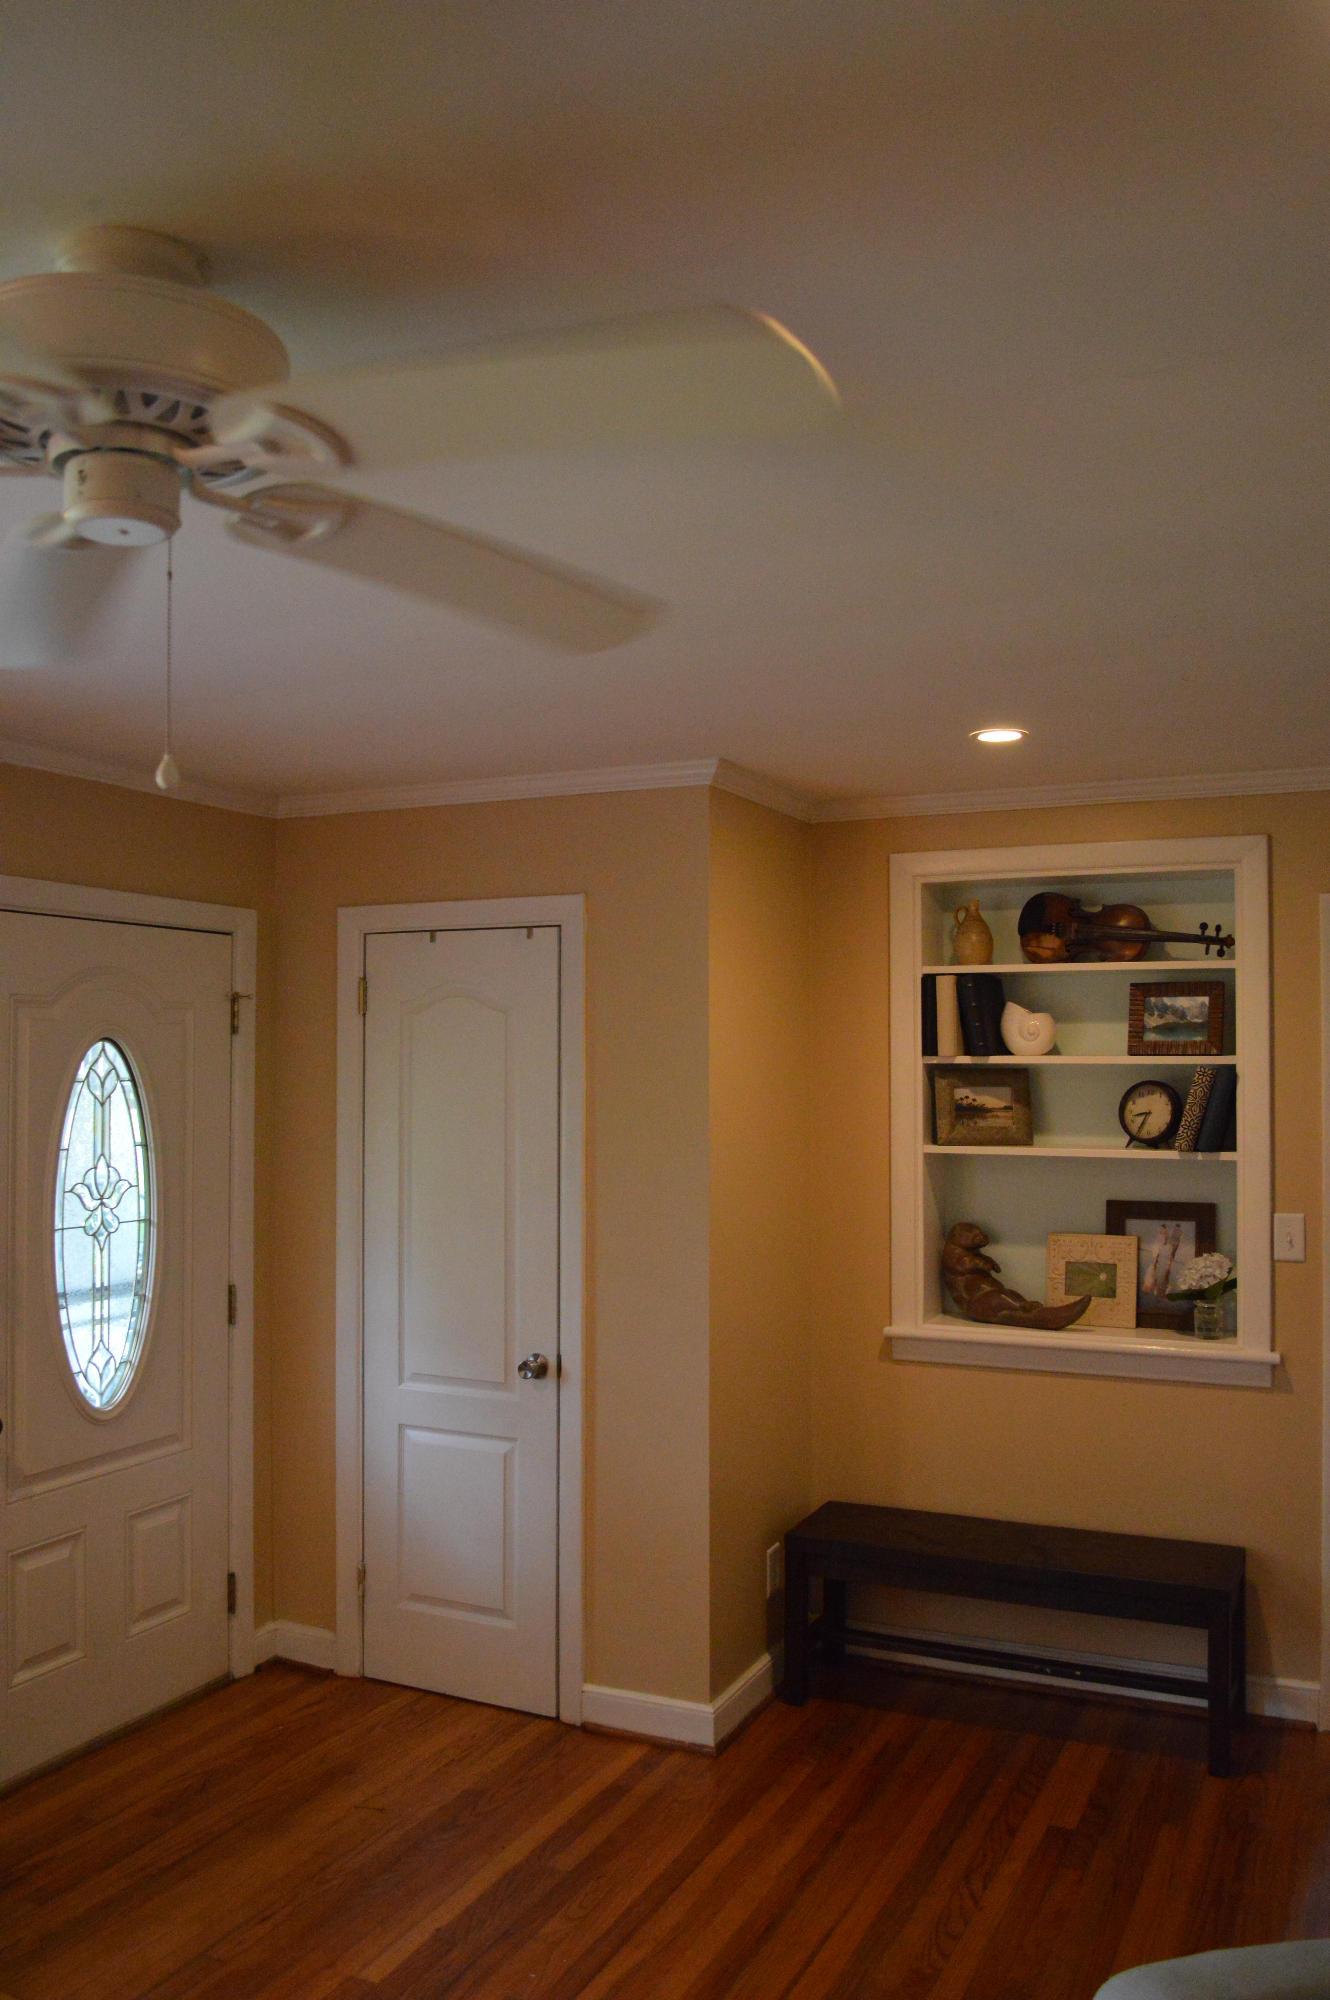 Woodland Shores Annex Homes For Sale - 436 Carol, Charleston, SC - 8